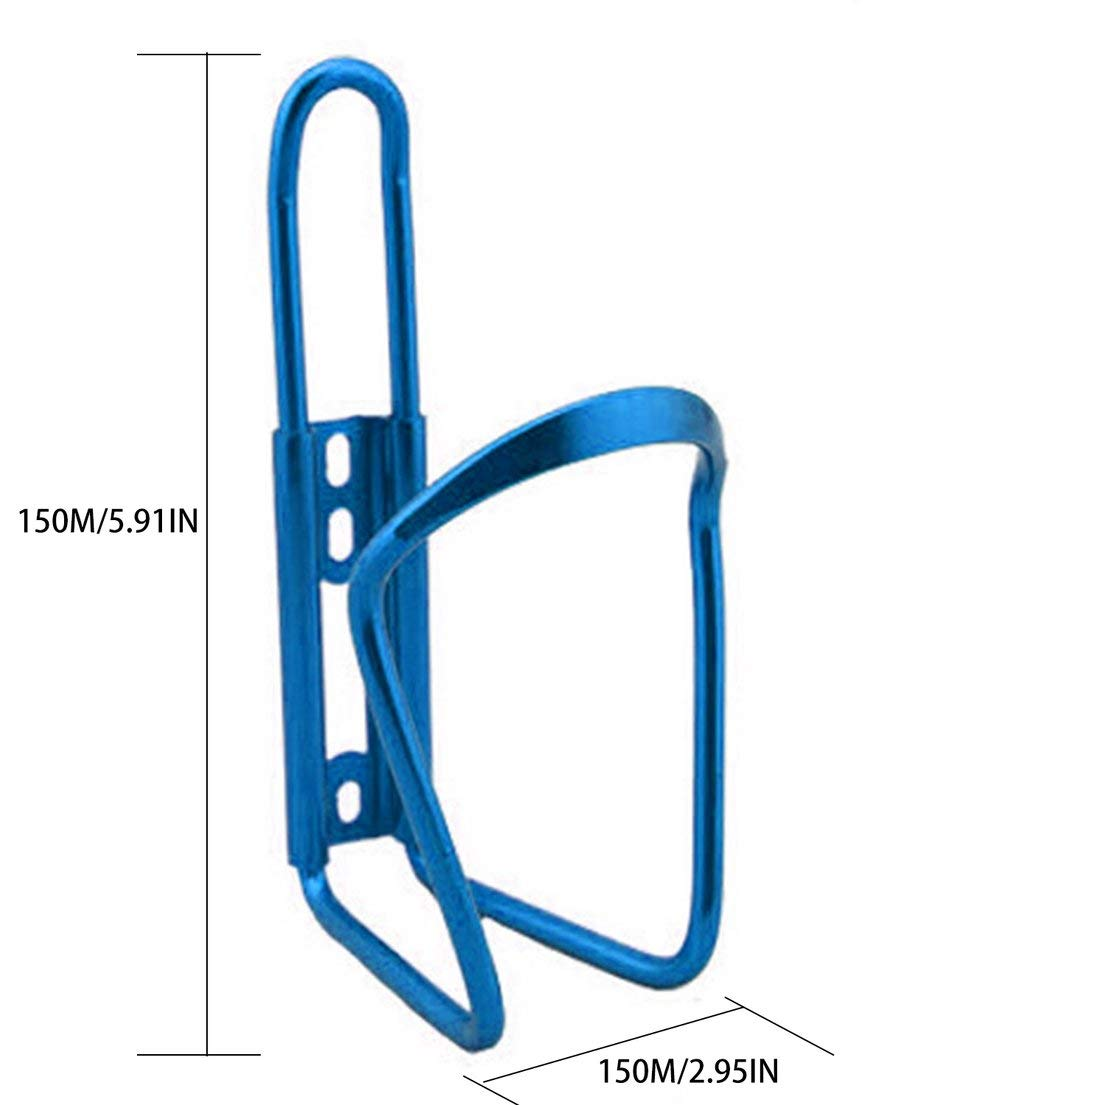 DFHJSXDFRGHXFGH-ES Aleaci/ón de Aluminio Ultraligera Bicicleta Titular de la Botella de Agua Jaula MTB Bicicleta de Carretera Botellas de Bebida Montaje en Rack Accesorios de ciclismoblue